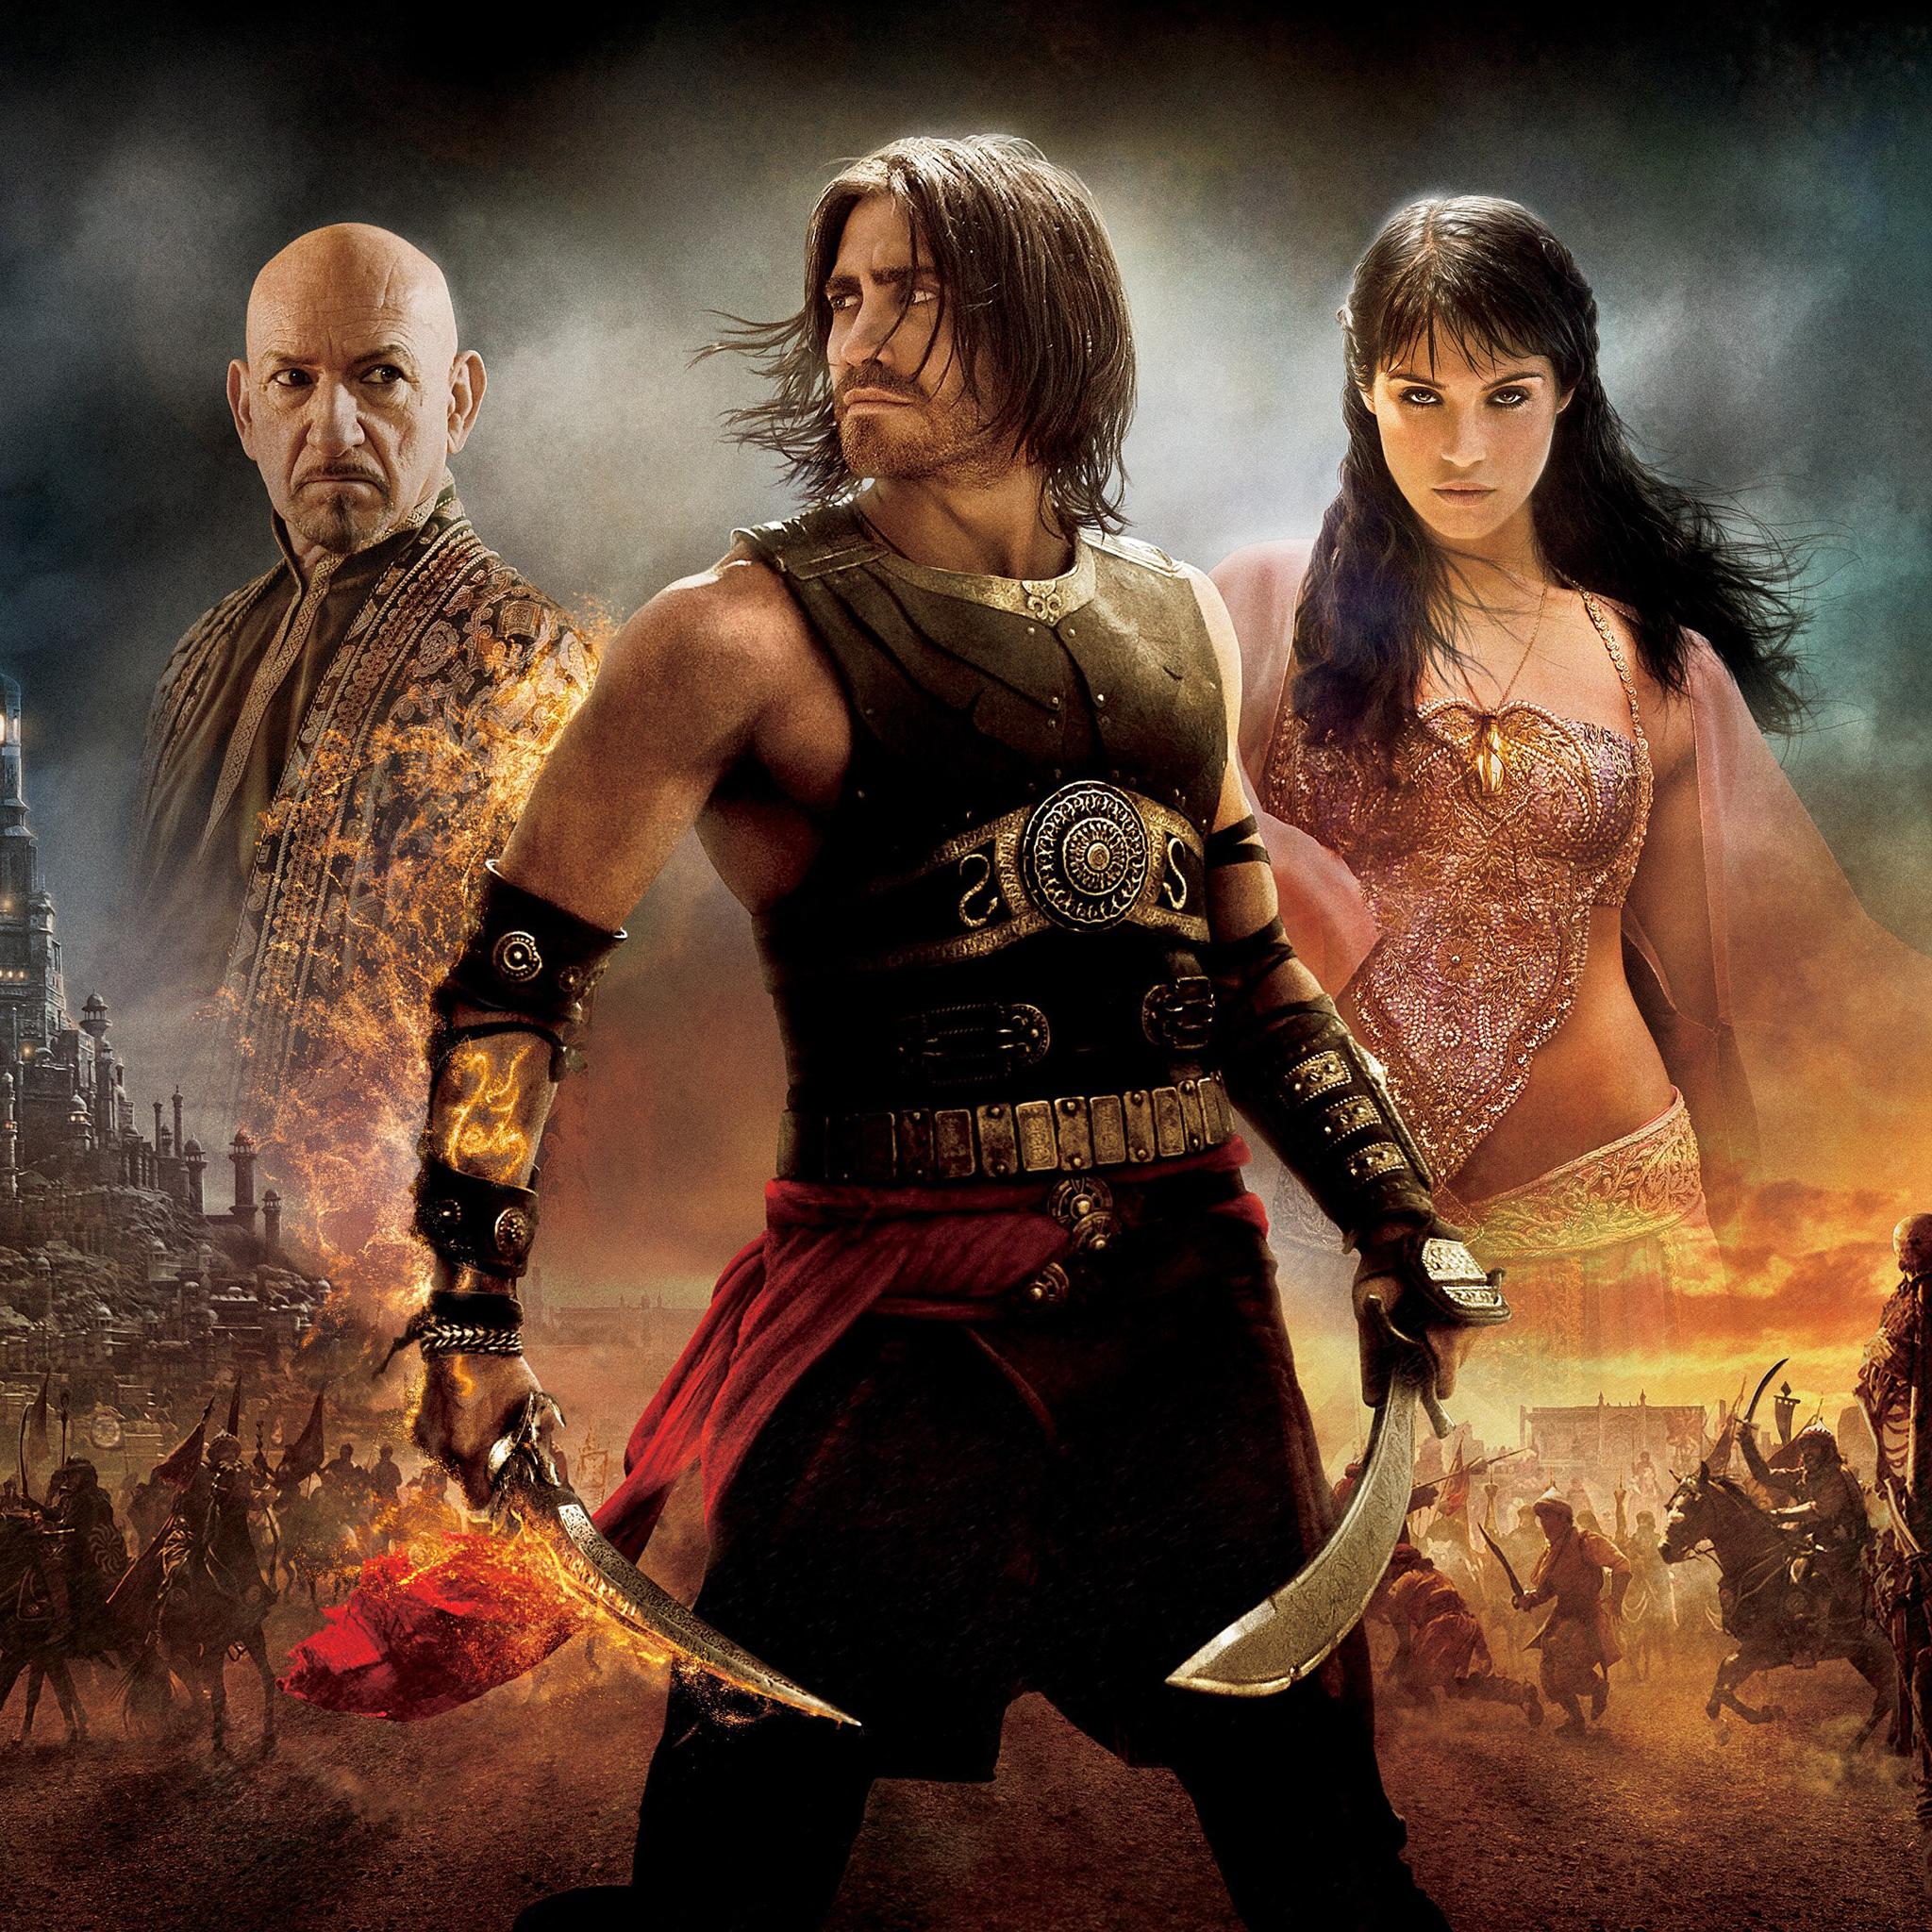 Prince-of-Persia-3Wallpapers-iPad